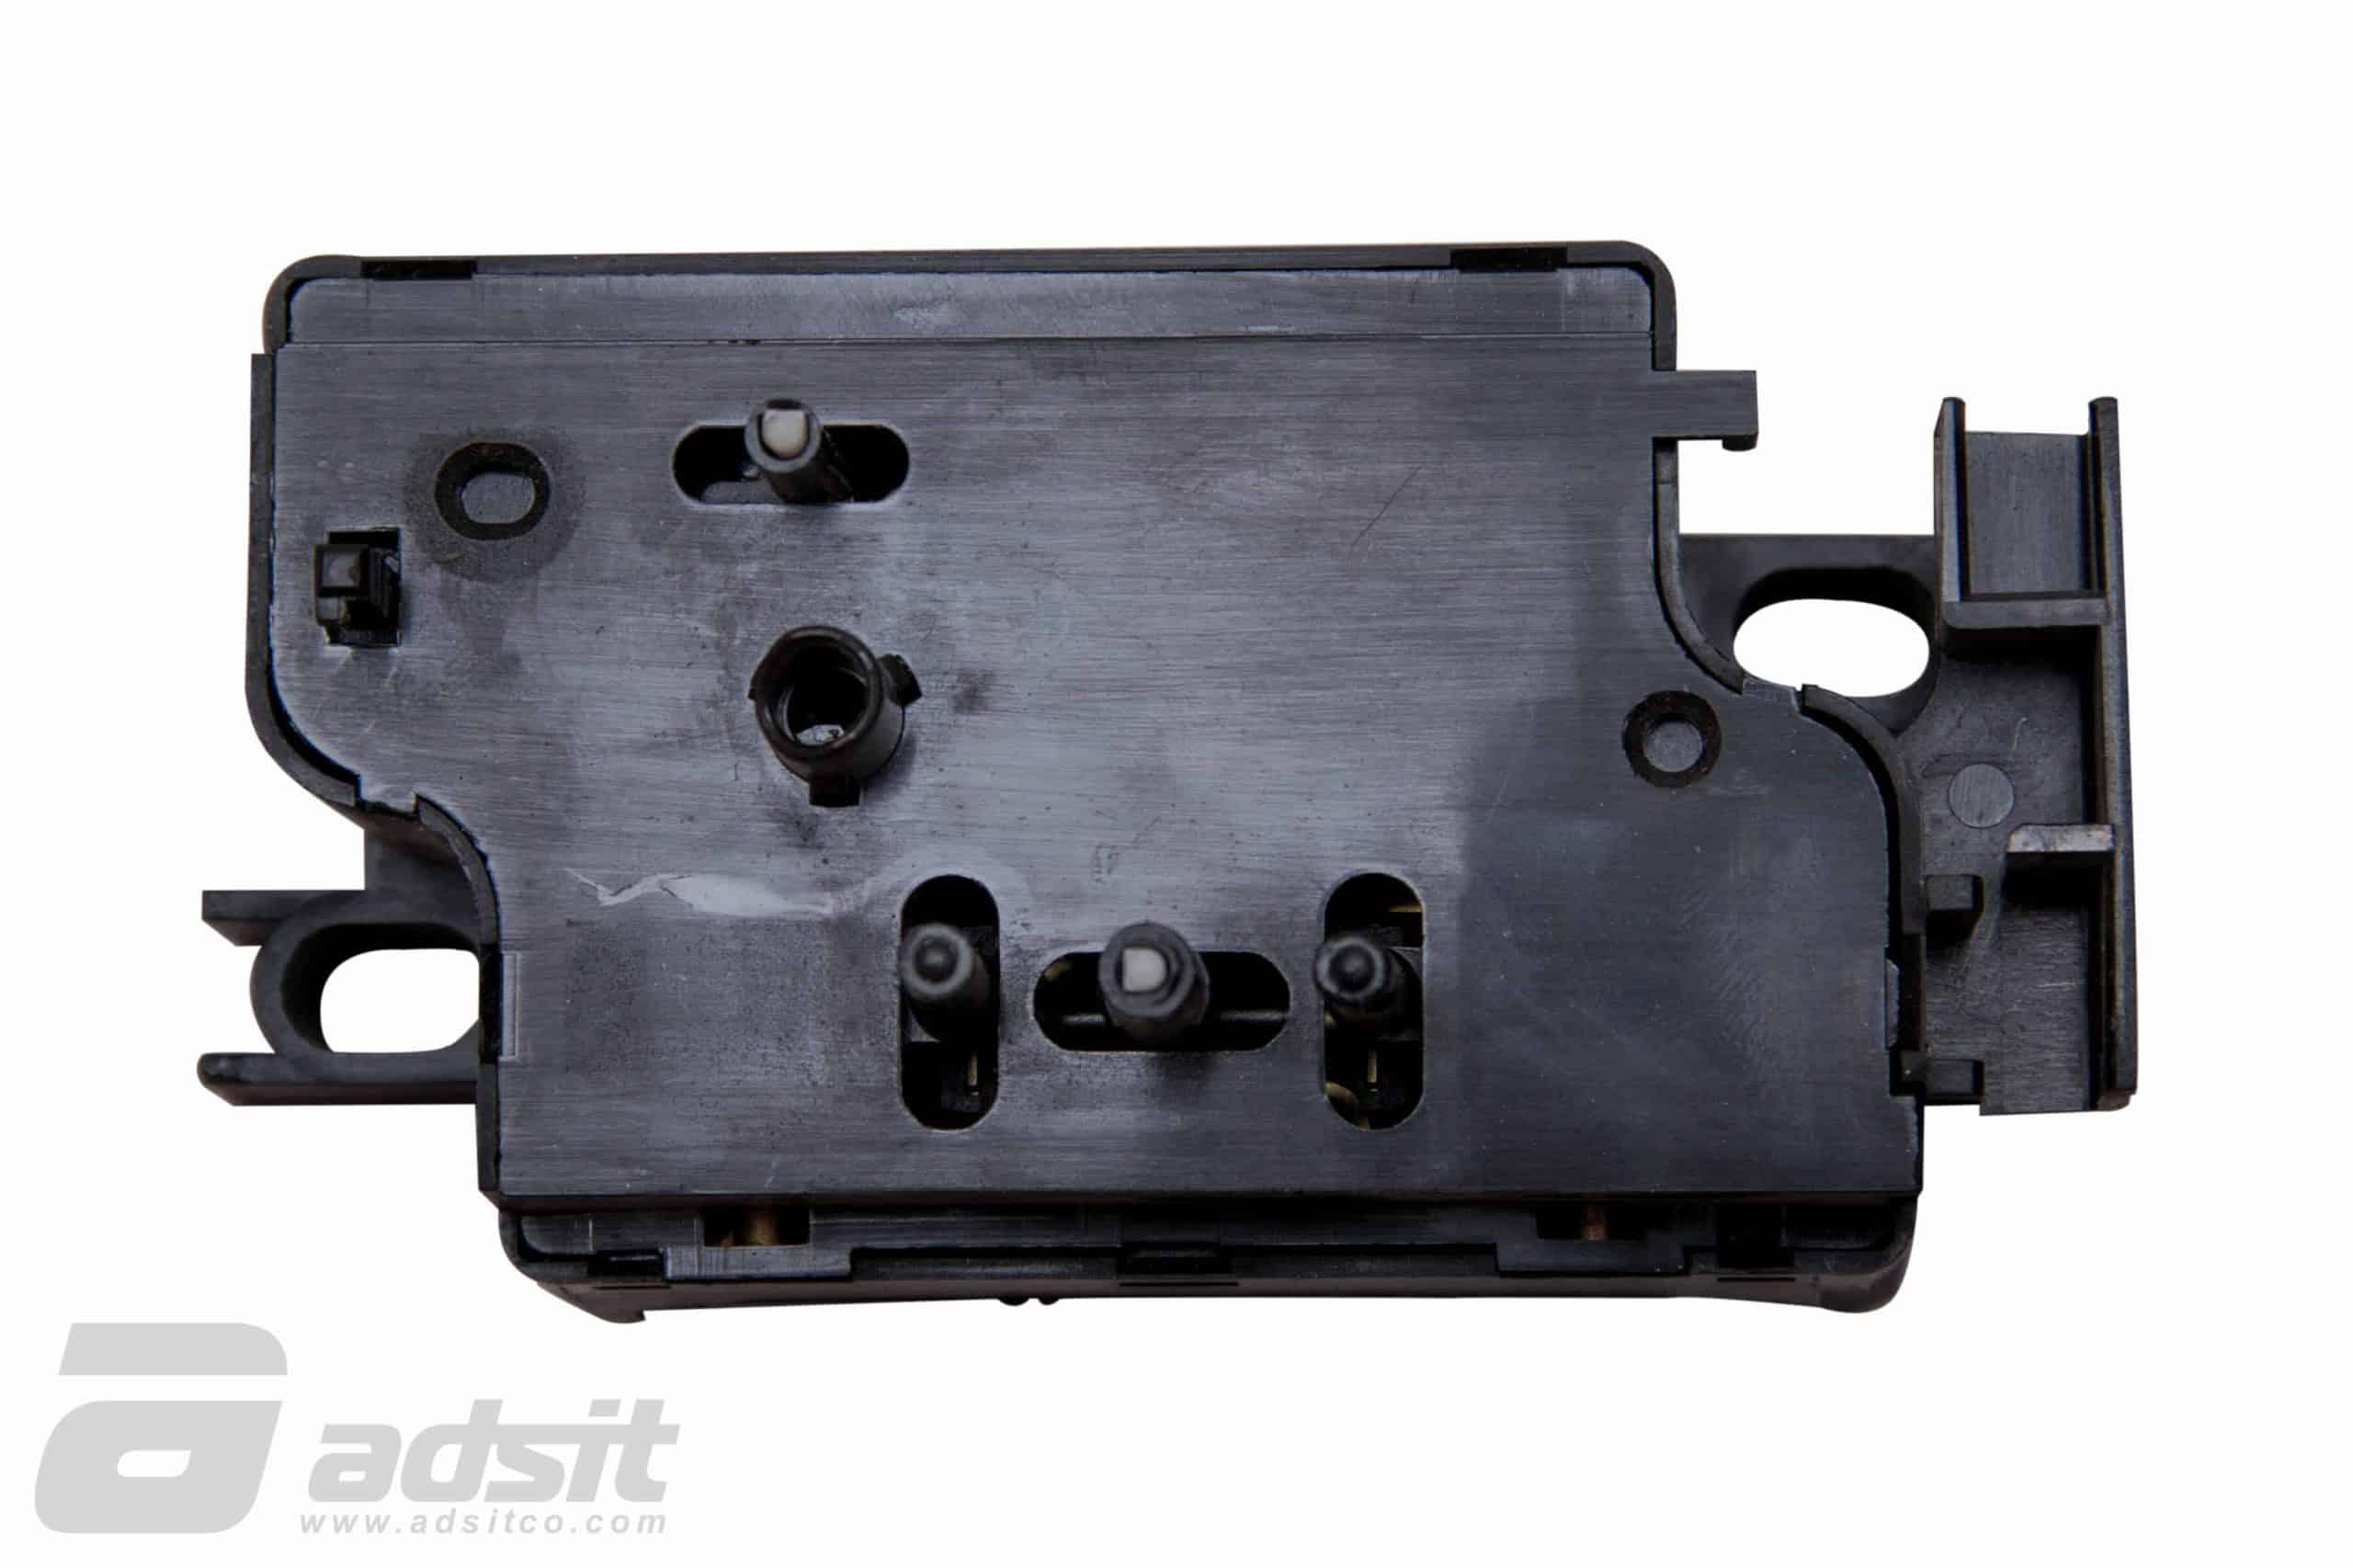 Backrest Adjustment Switch